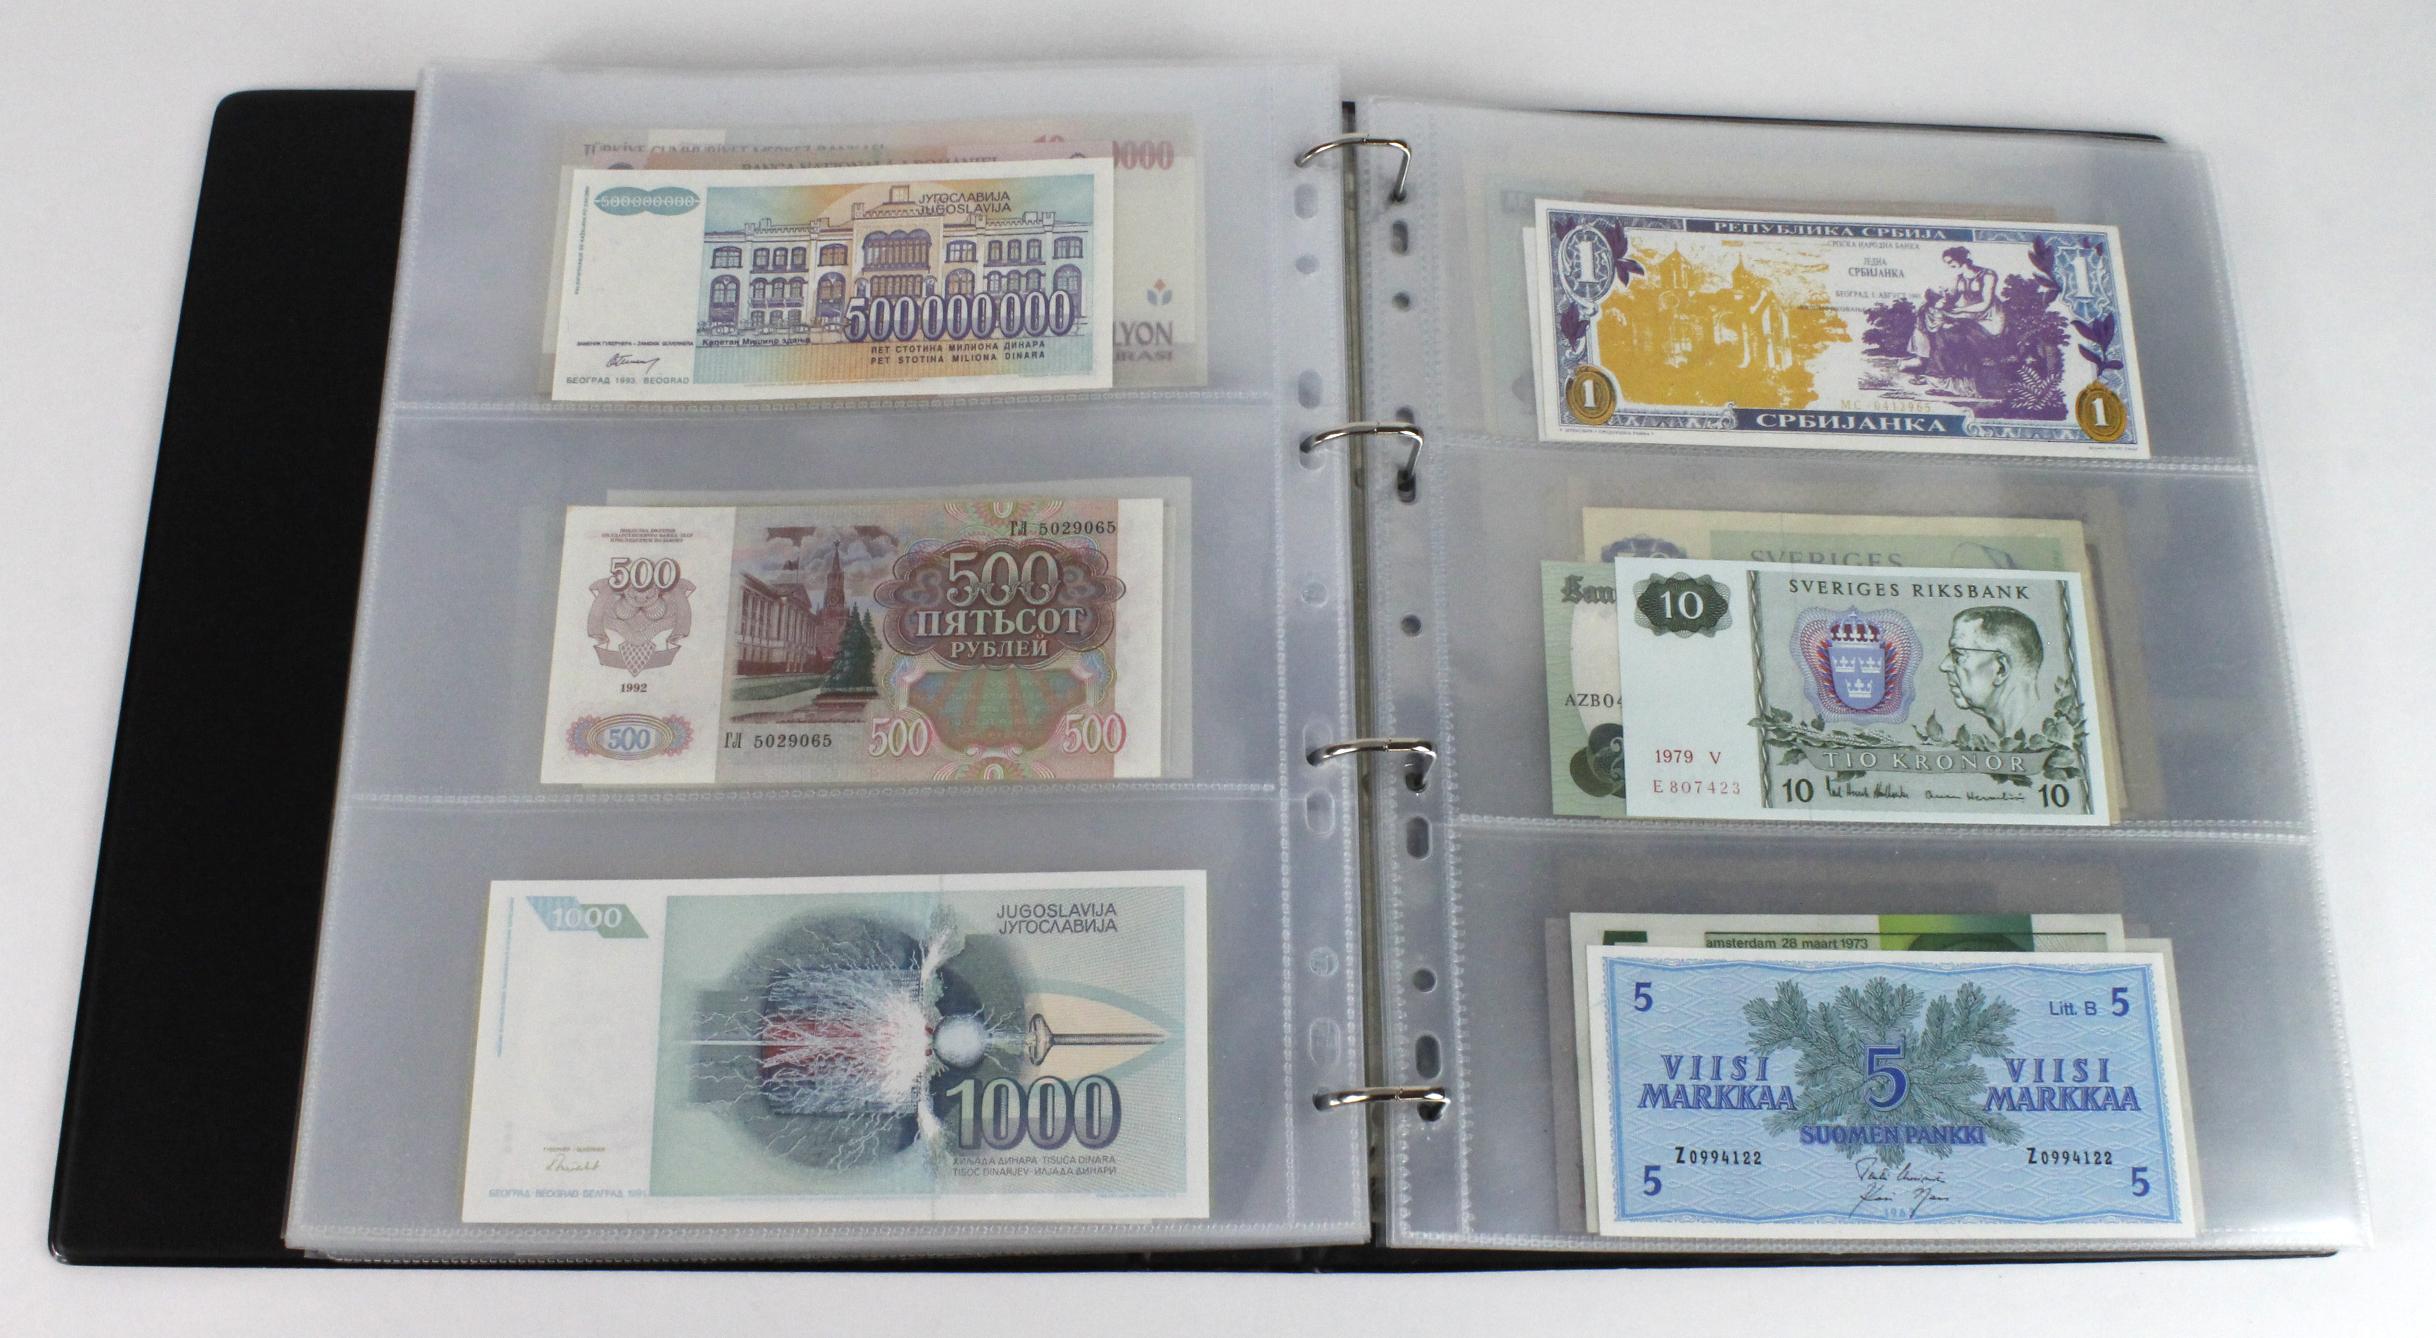 World (163), in banknote album including Bahamas, Spain, Sweden, Netherlands, Algeria, Macau, - Image 44 of 57